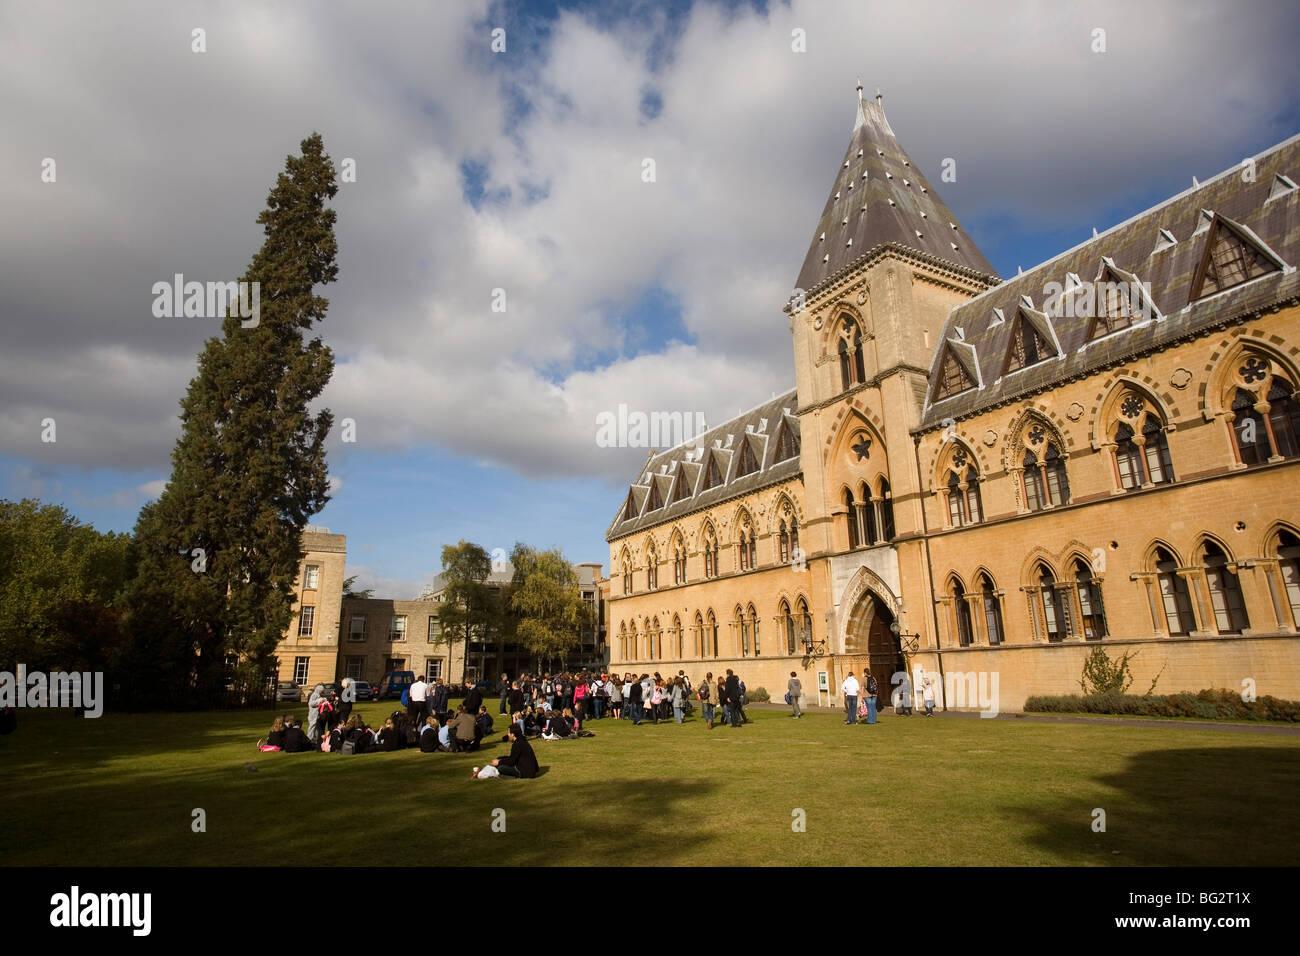 Pitt Rivers Museum, Oxford, England, UK - Stock Image